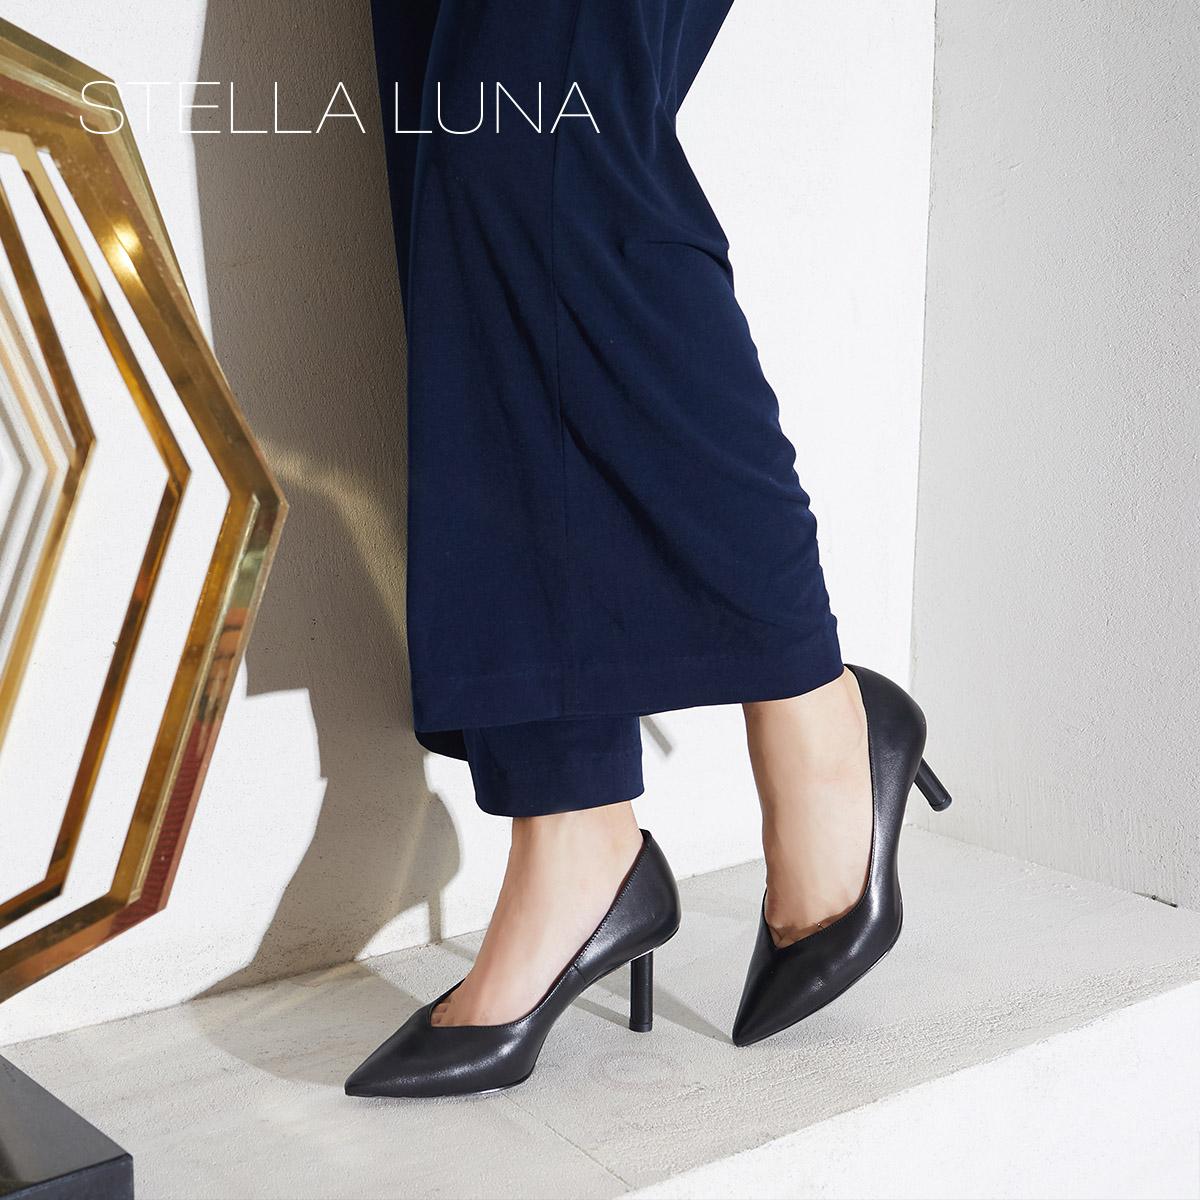 STELLA LUNA2018秋季新款牛皮尖头香烟跟细跟高跟鞋通勤女单鞋